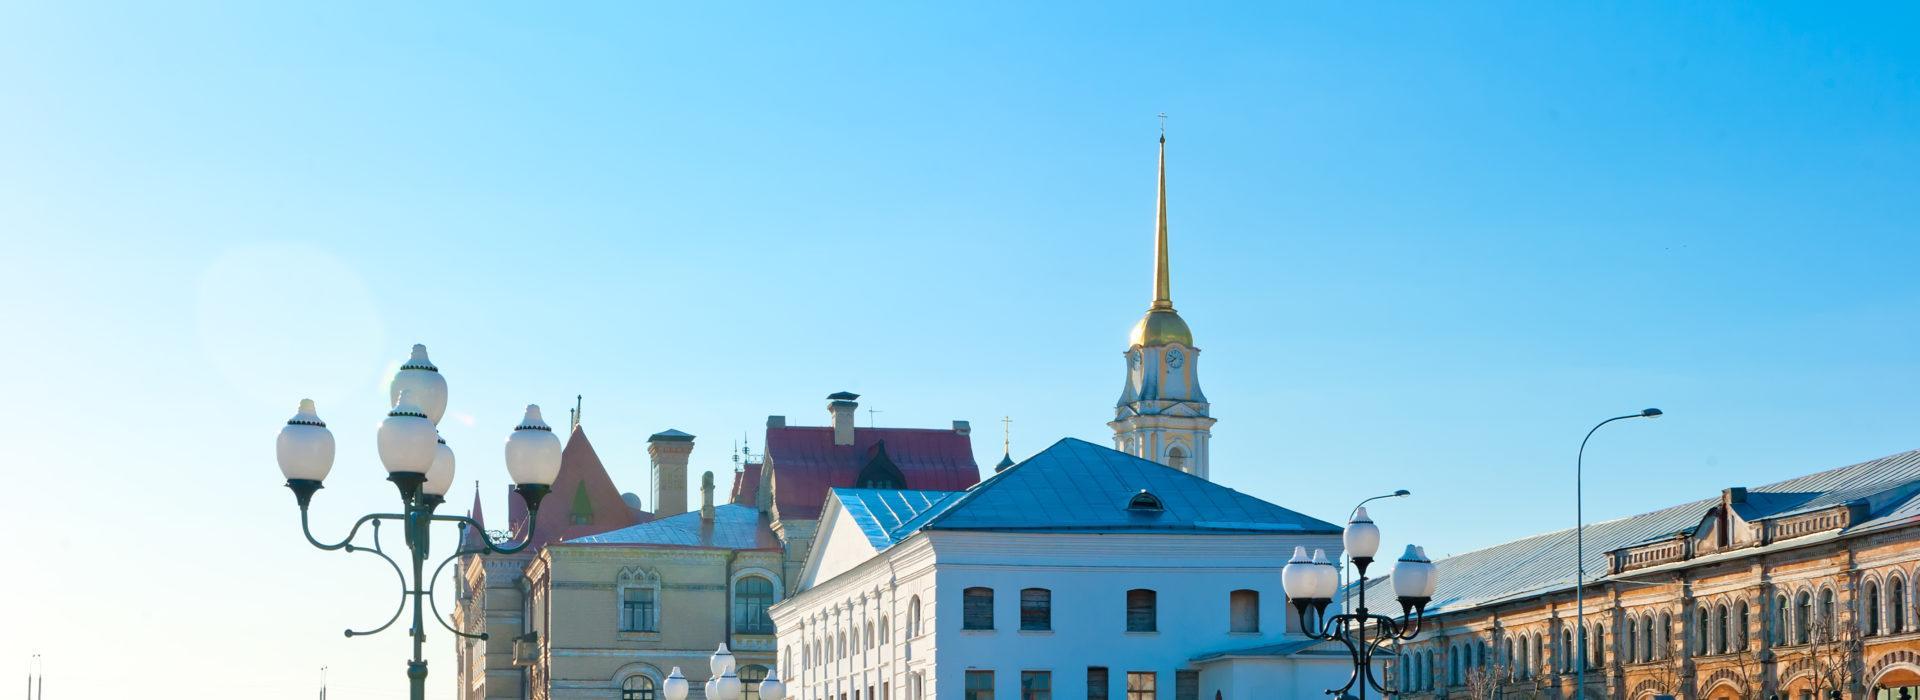 Май в Рыбинске: затопленная Молога и квест по «Двенадцати стульям»